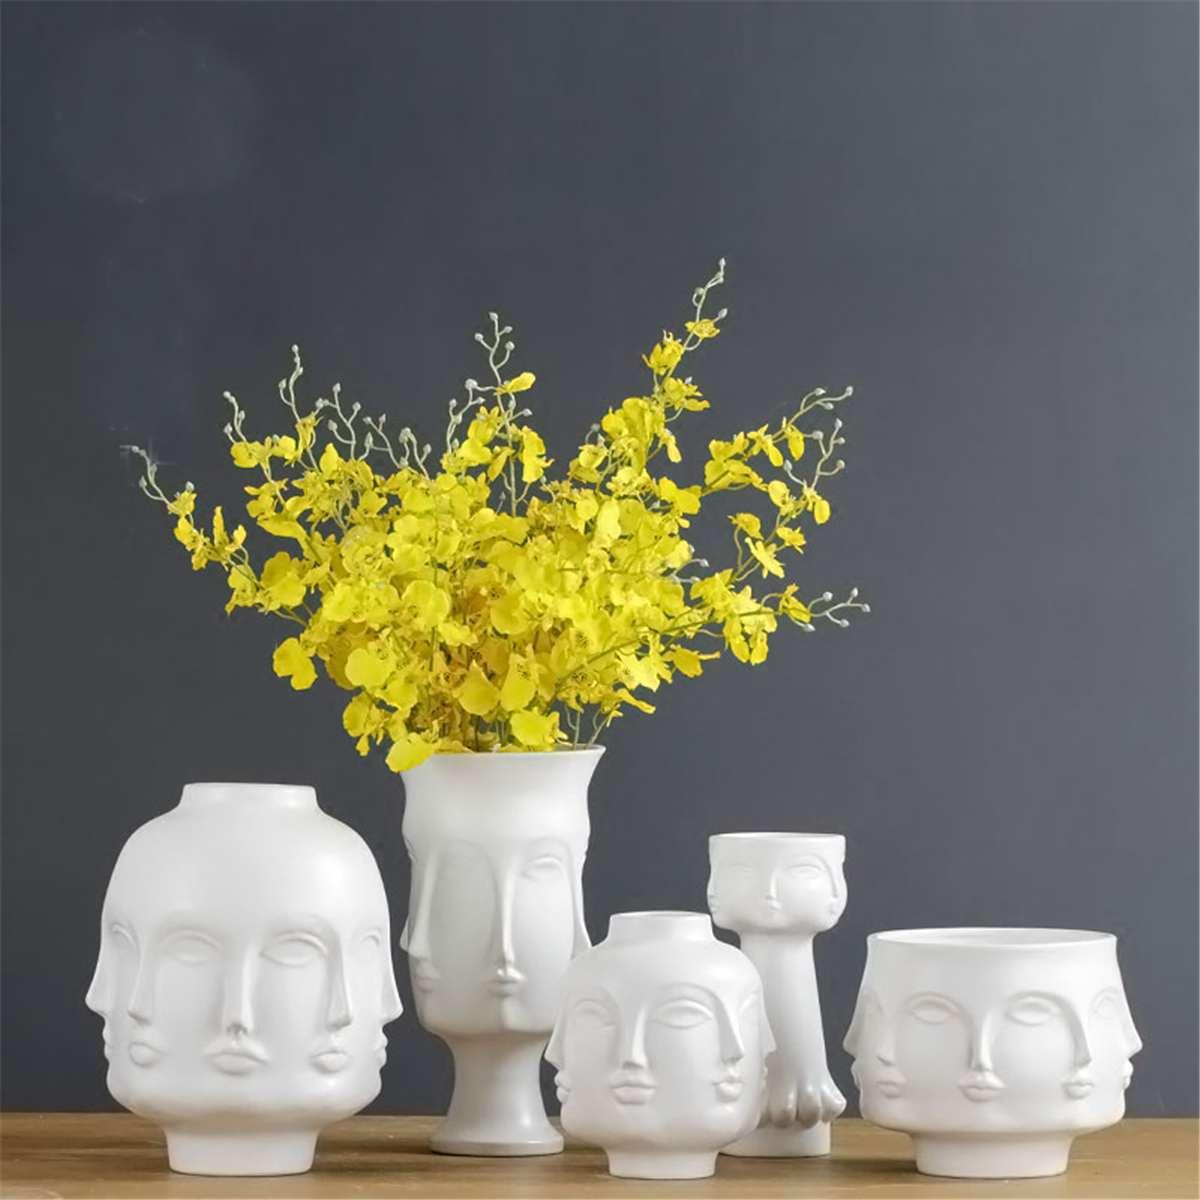 Ceramic Abstract Vase White Human Face Vases Display Room Decorative Figure Nordic Minimalist Head Shape Vase Flower Ornament